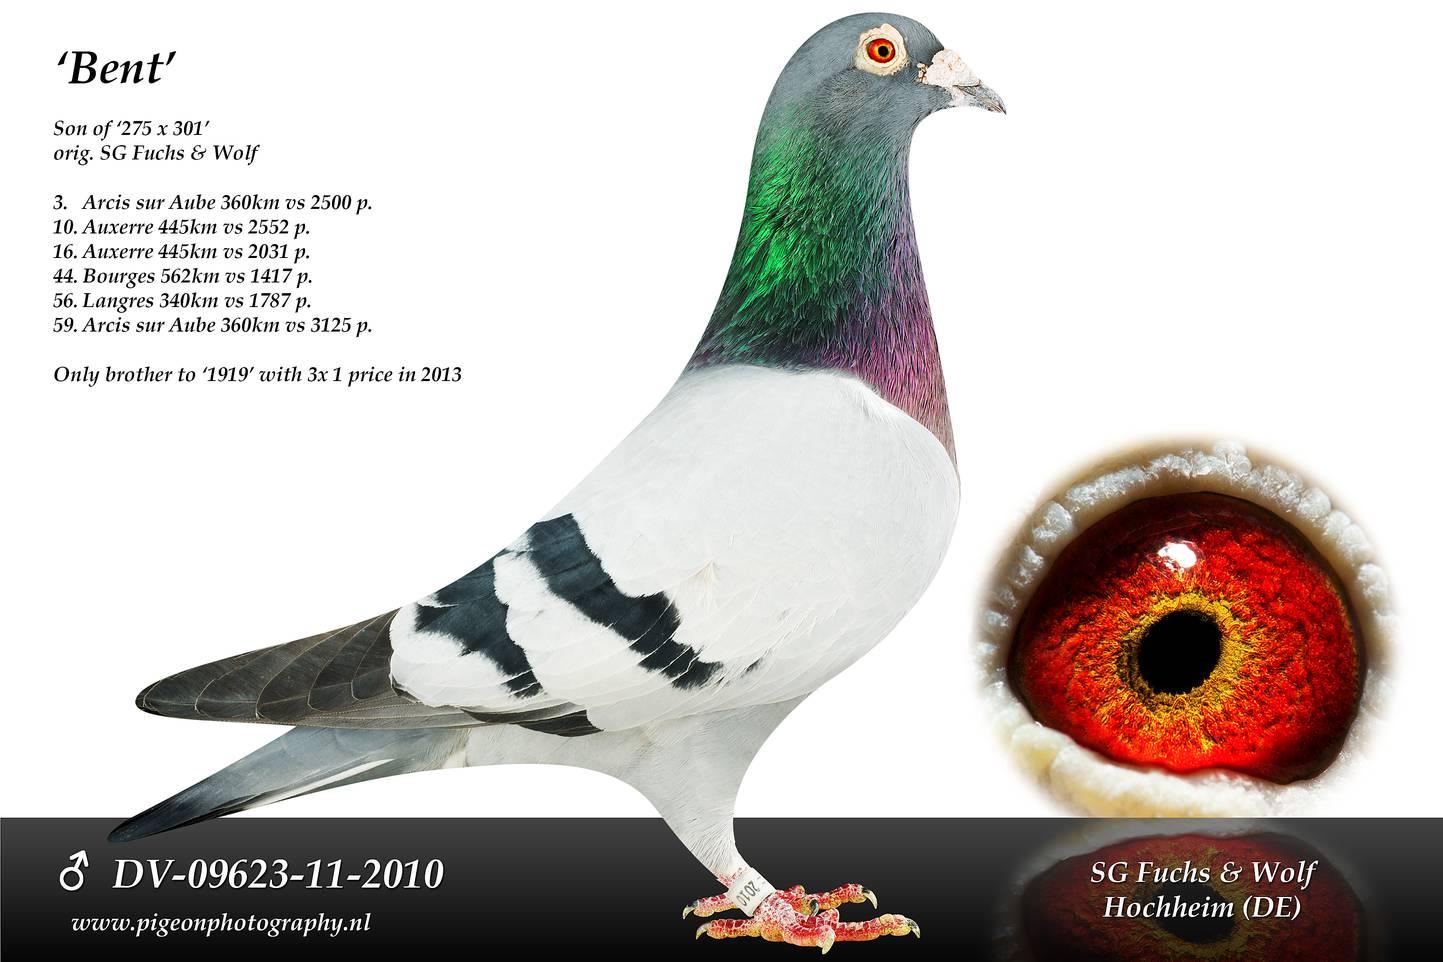 DV 09623 11 2010